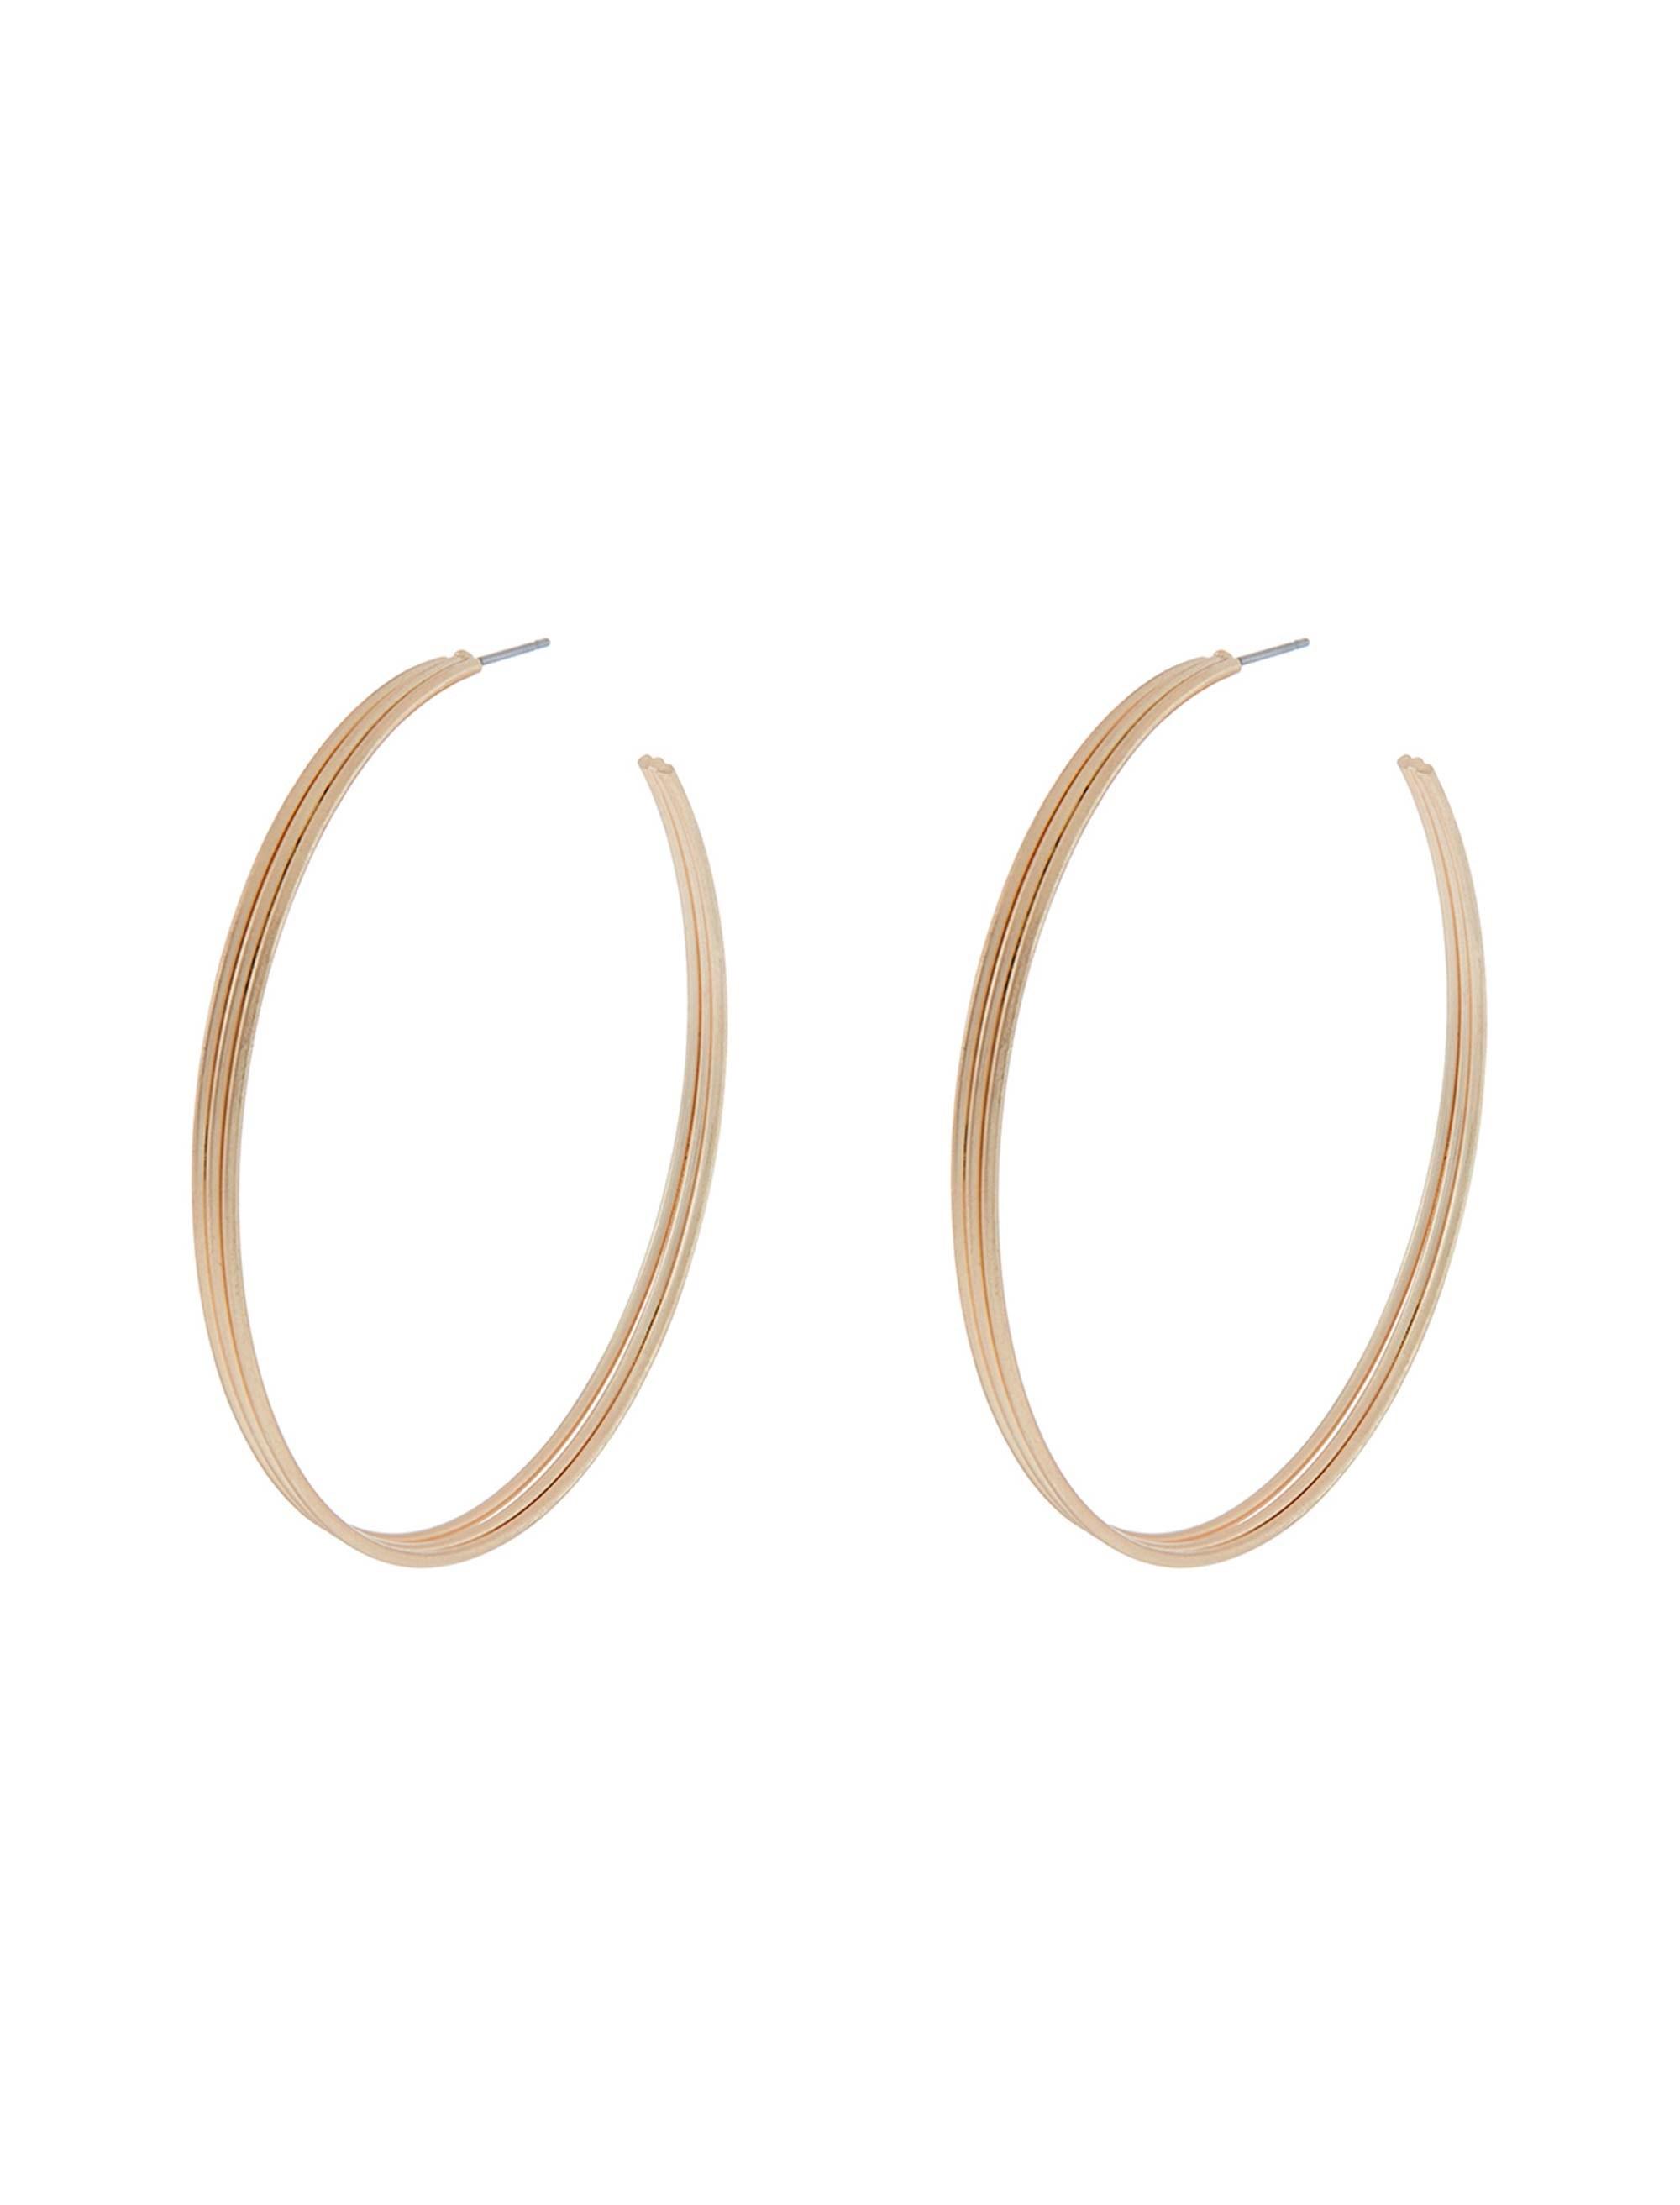 گوشواره استیل حلقهای زنانه Brushed Triple Hoop - اکسسورایز تک سایز